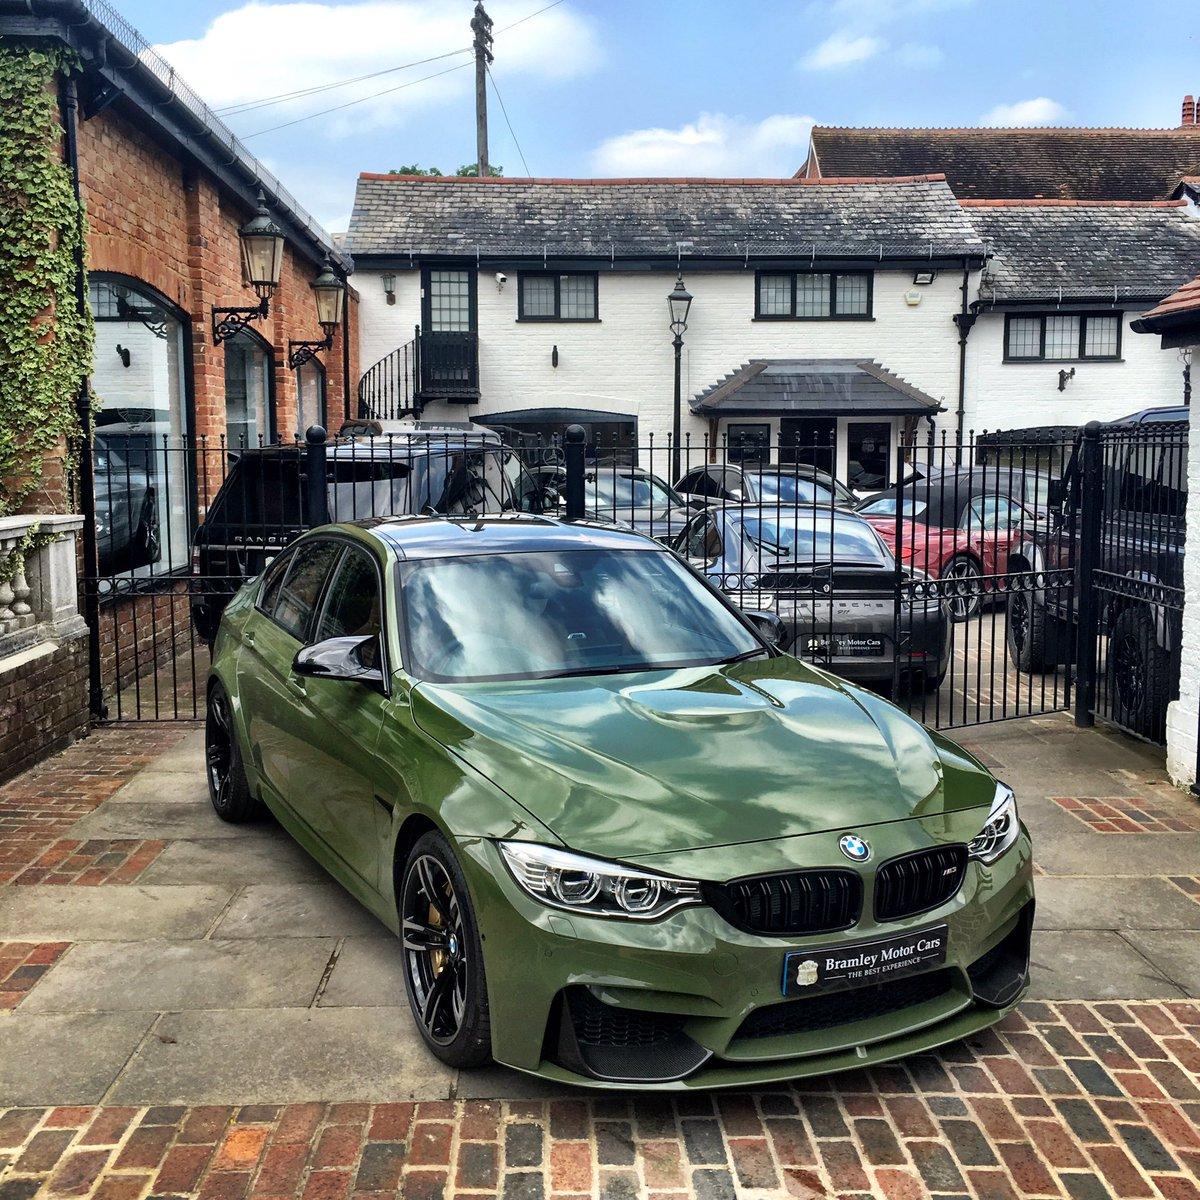 "2016 Bmw M3: Bramley Motor Cars On Twitter: ""New To Stock! 2016/16 BMW"